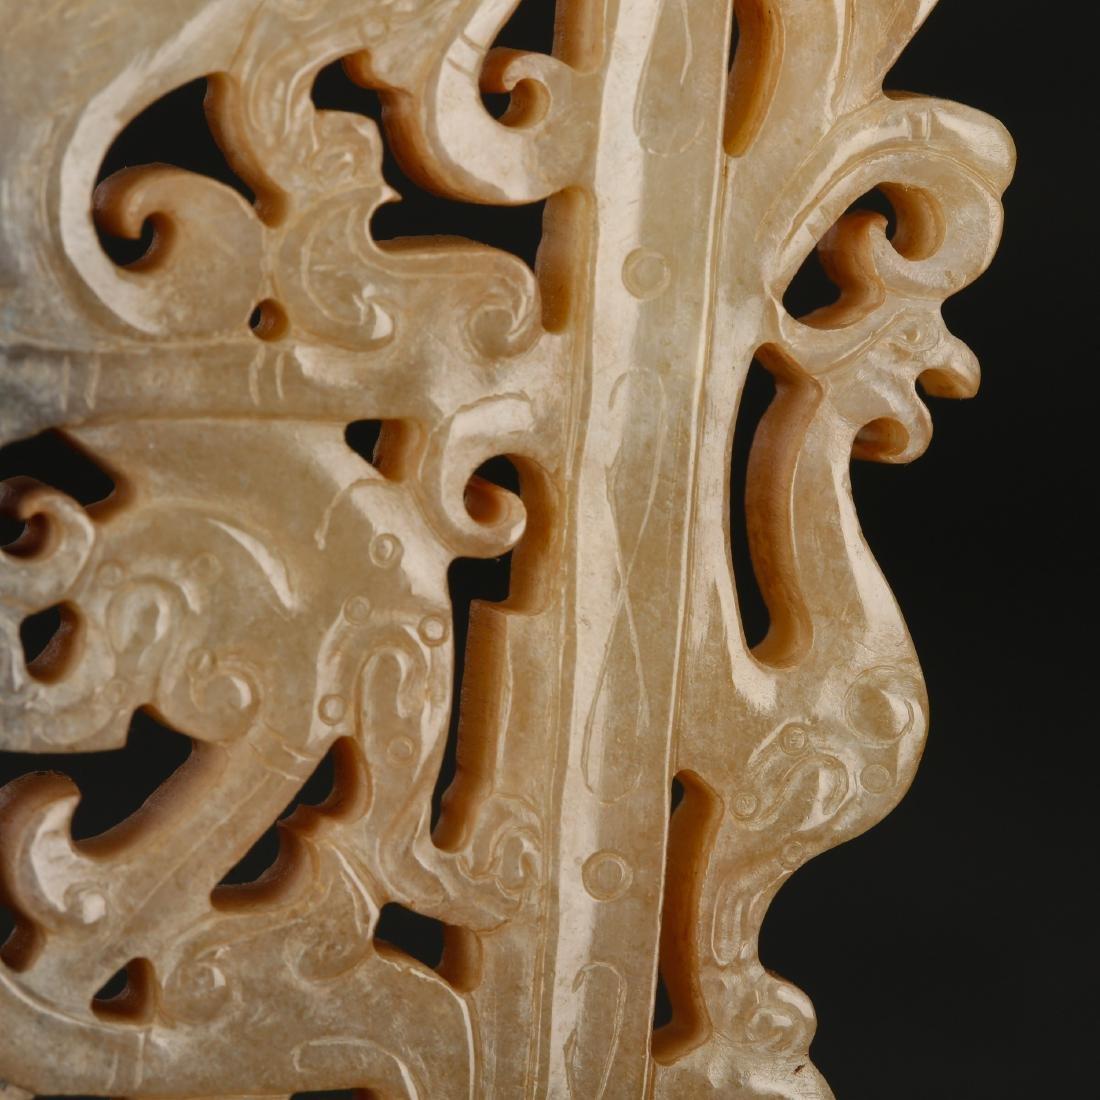 CHINESE ARCHAIC JADE PENDANT - 6